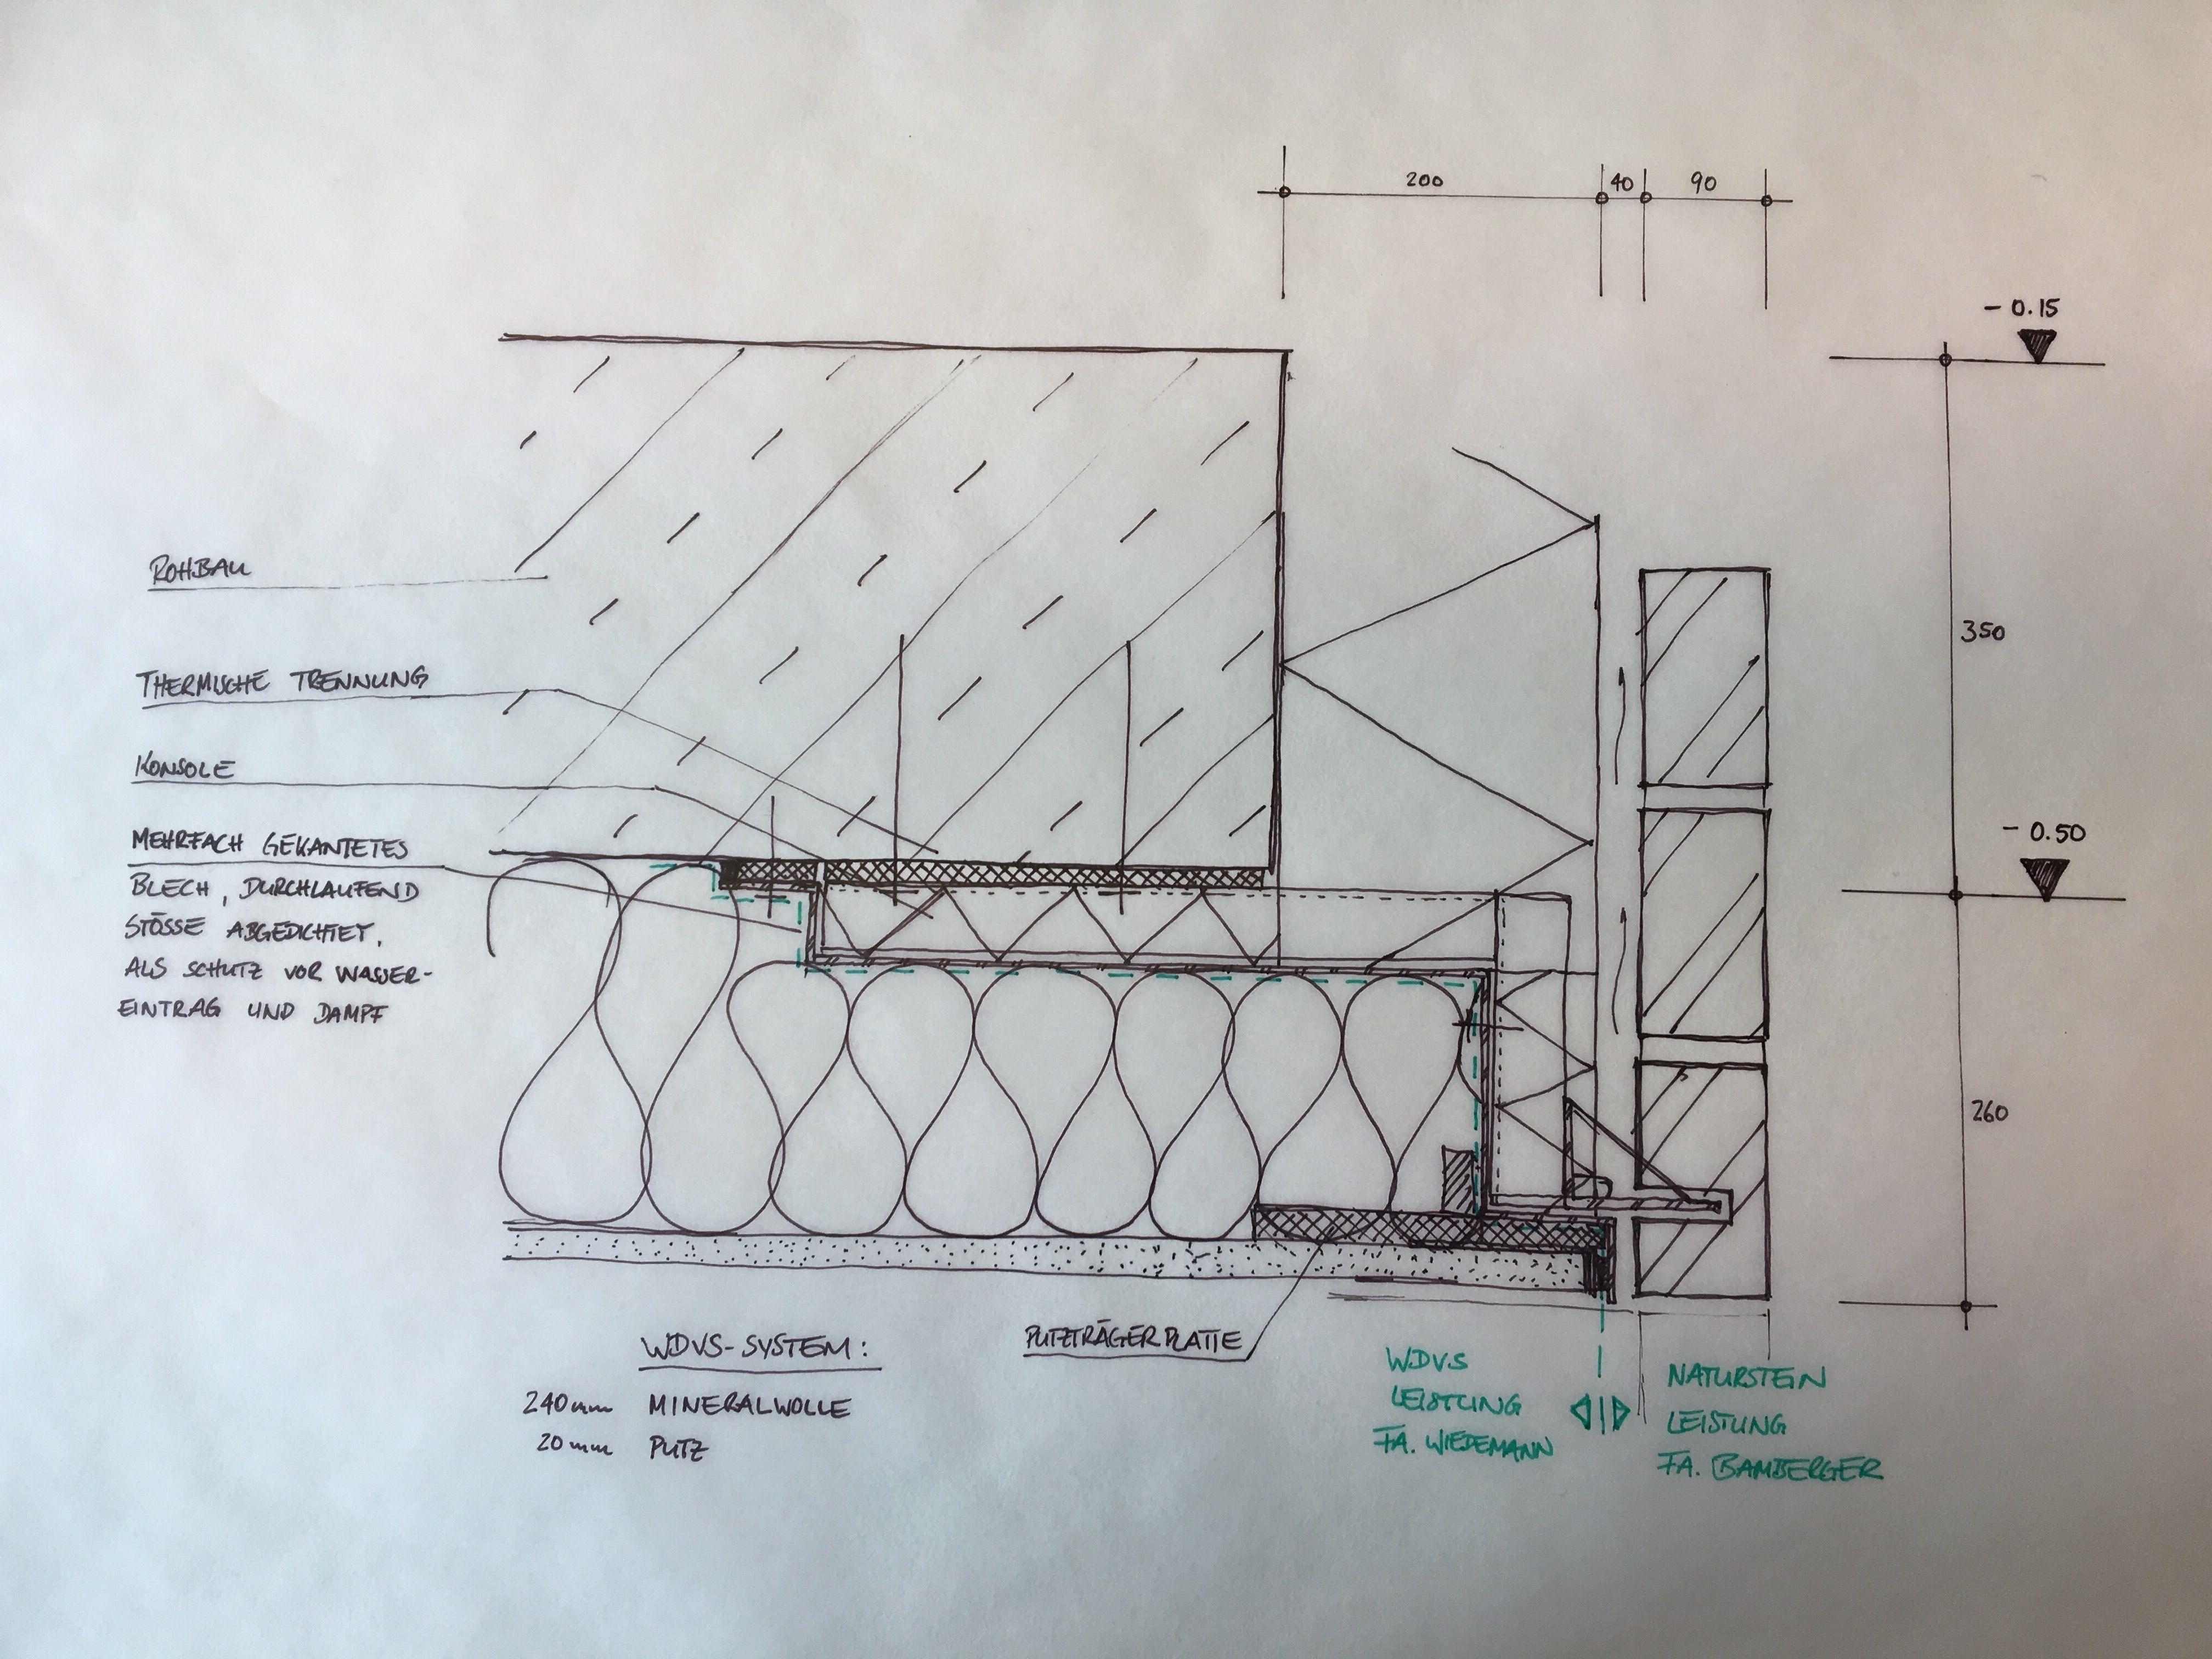 brick mauerwerk insulation sketch skizze. Black Bedroom Furniture Sets. Home Design Ideas